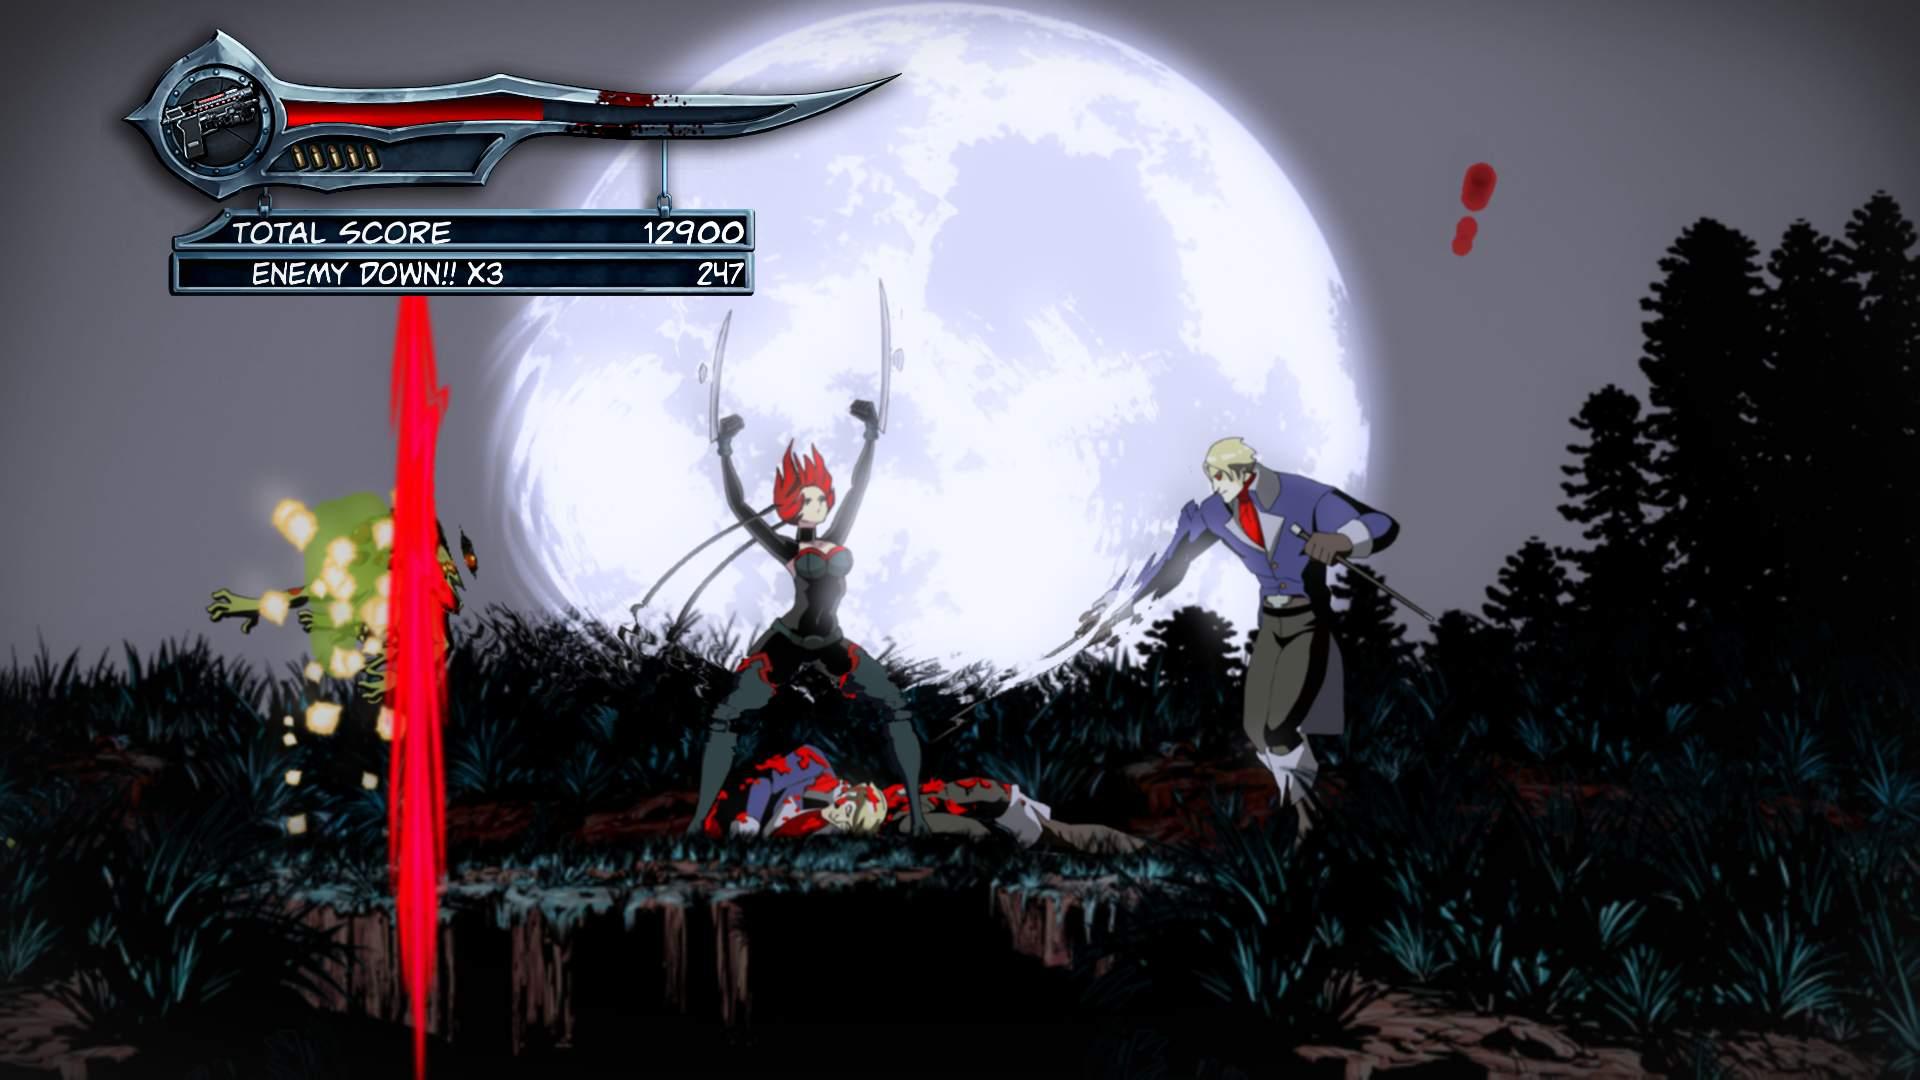 BloodRayne Betrayal: Fresh Bites ritorna su PC e console